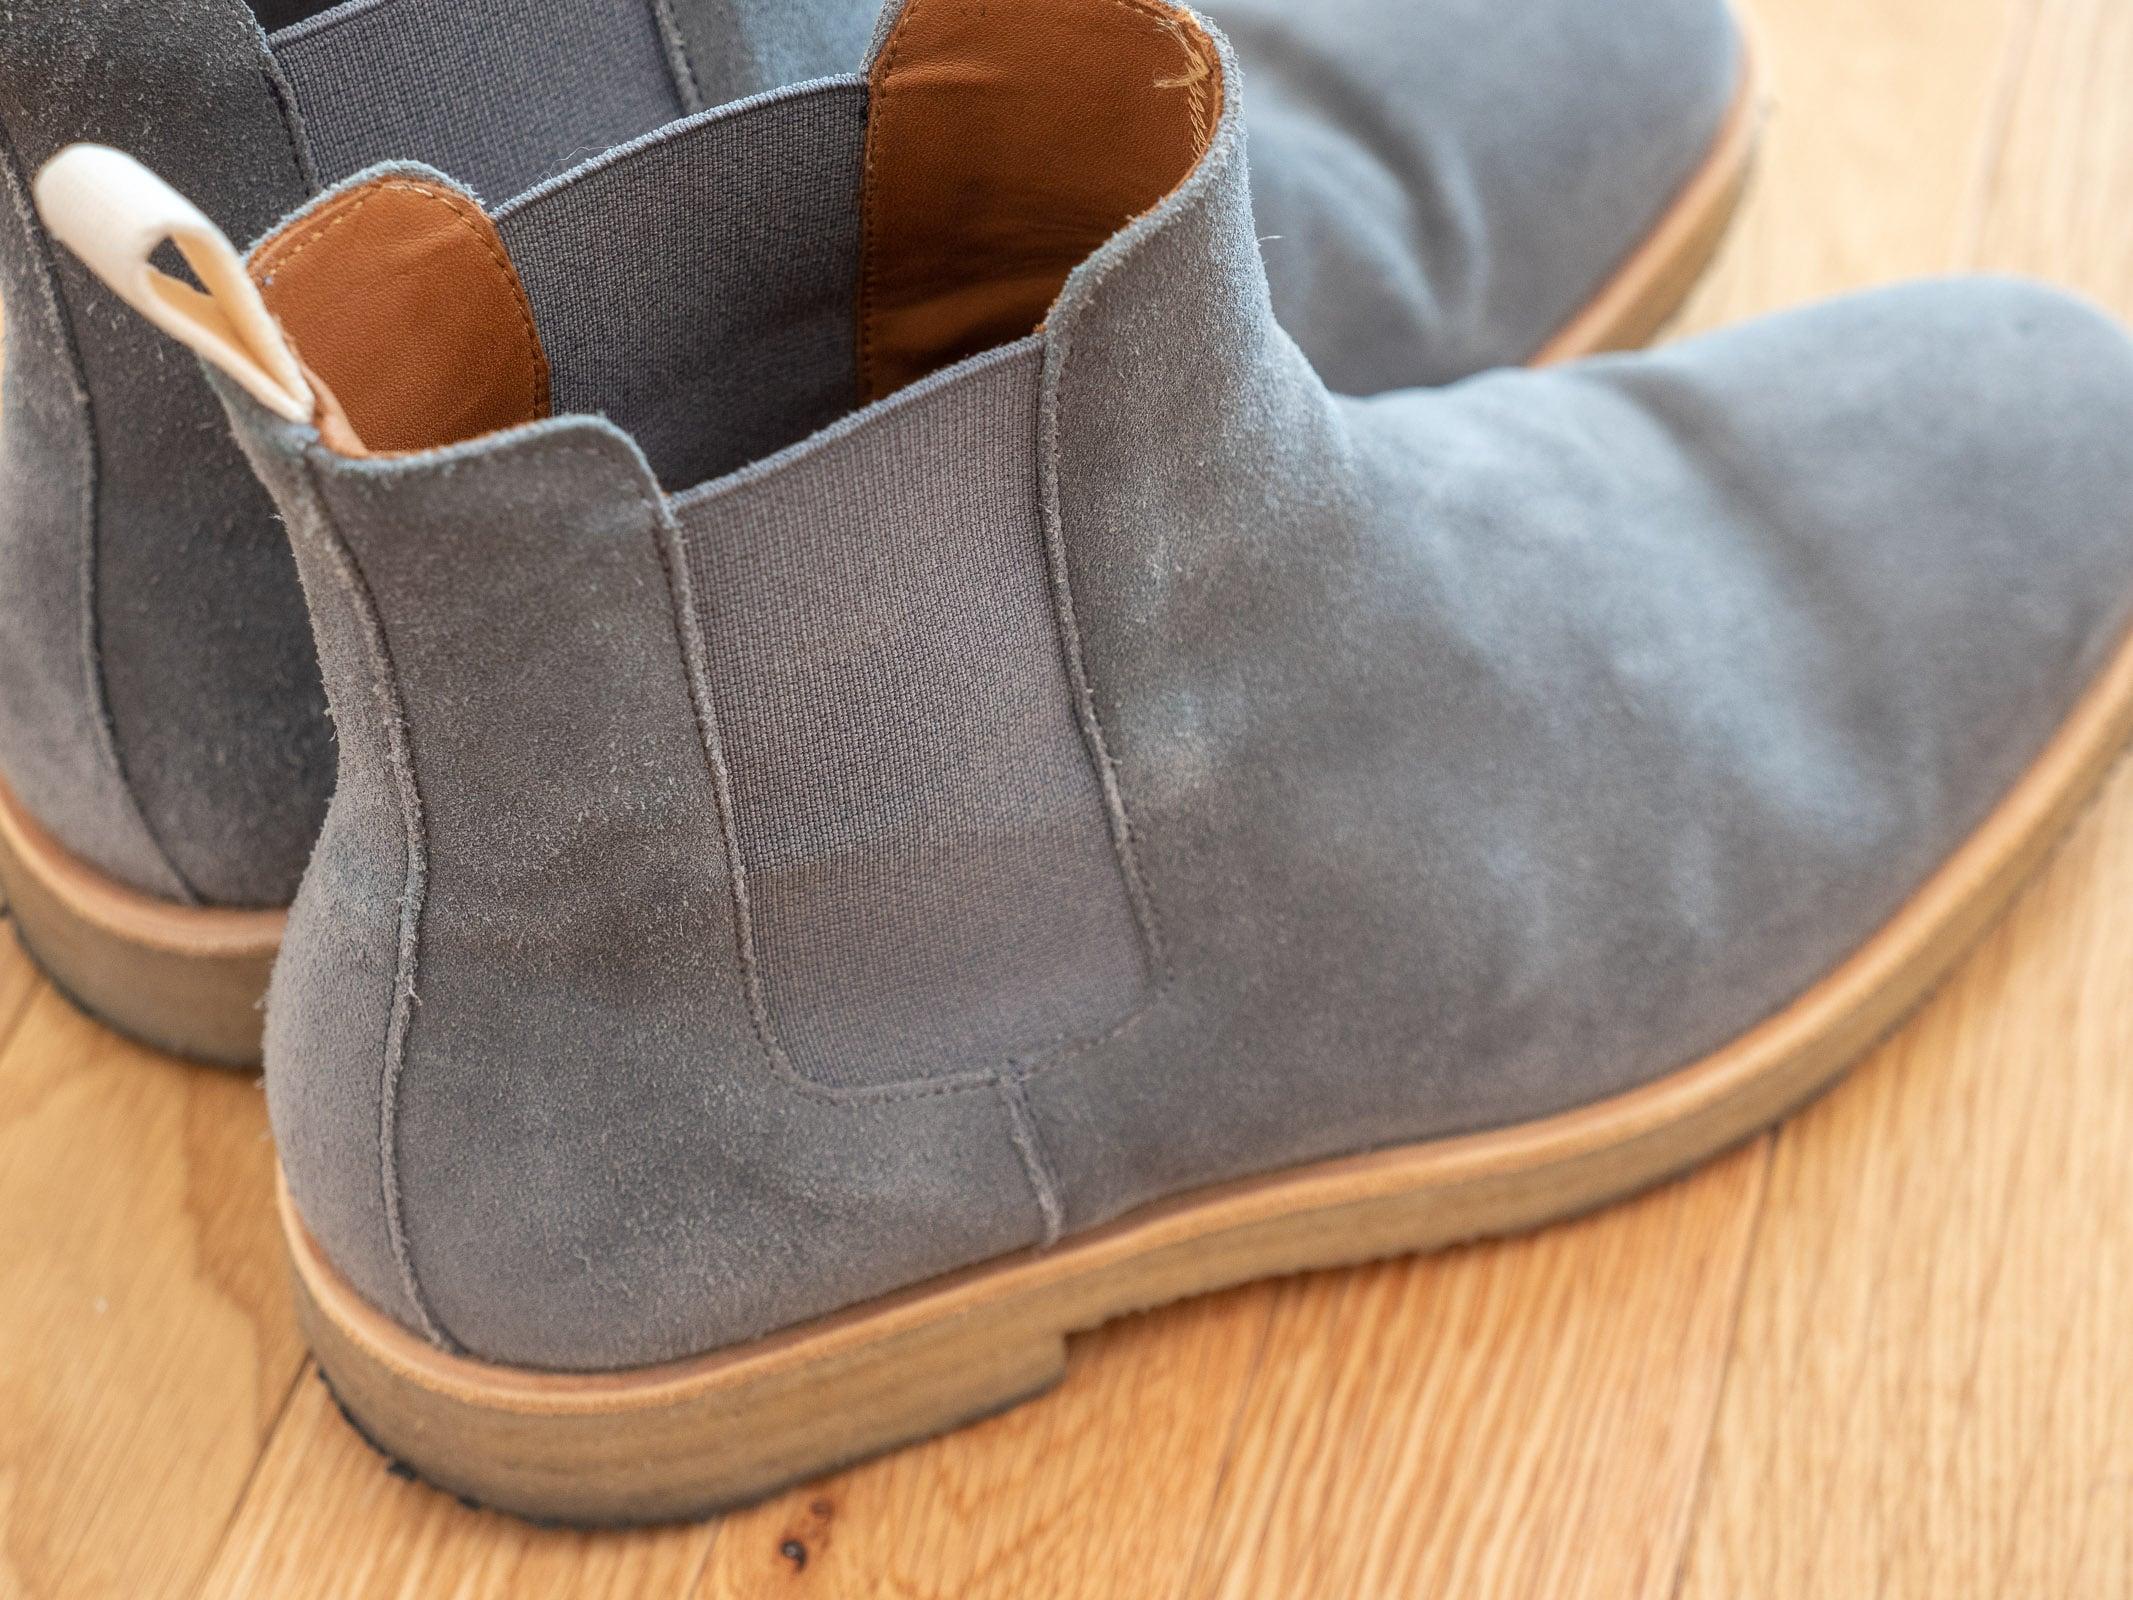 Chelsea boot elastic side panel